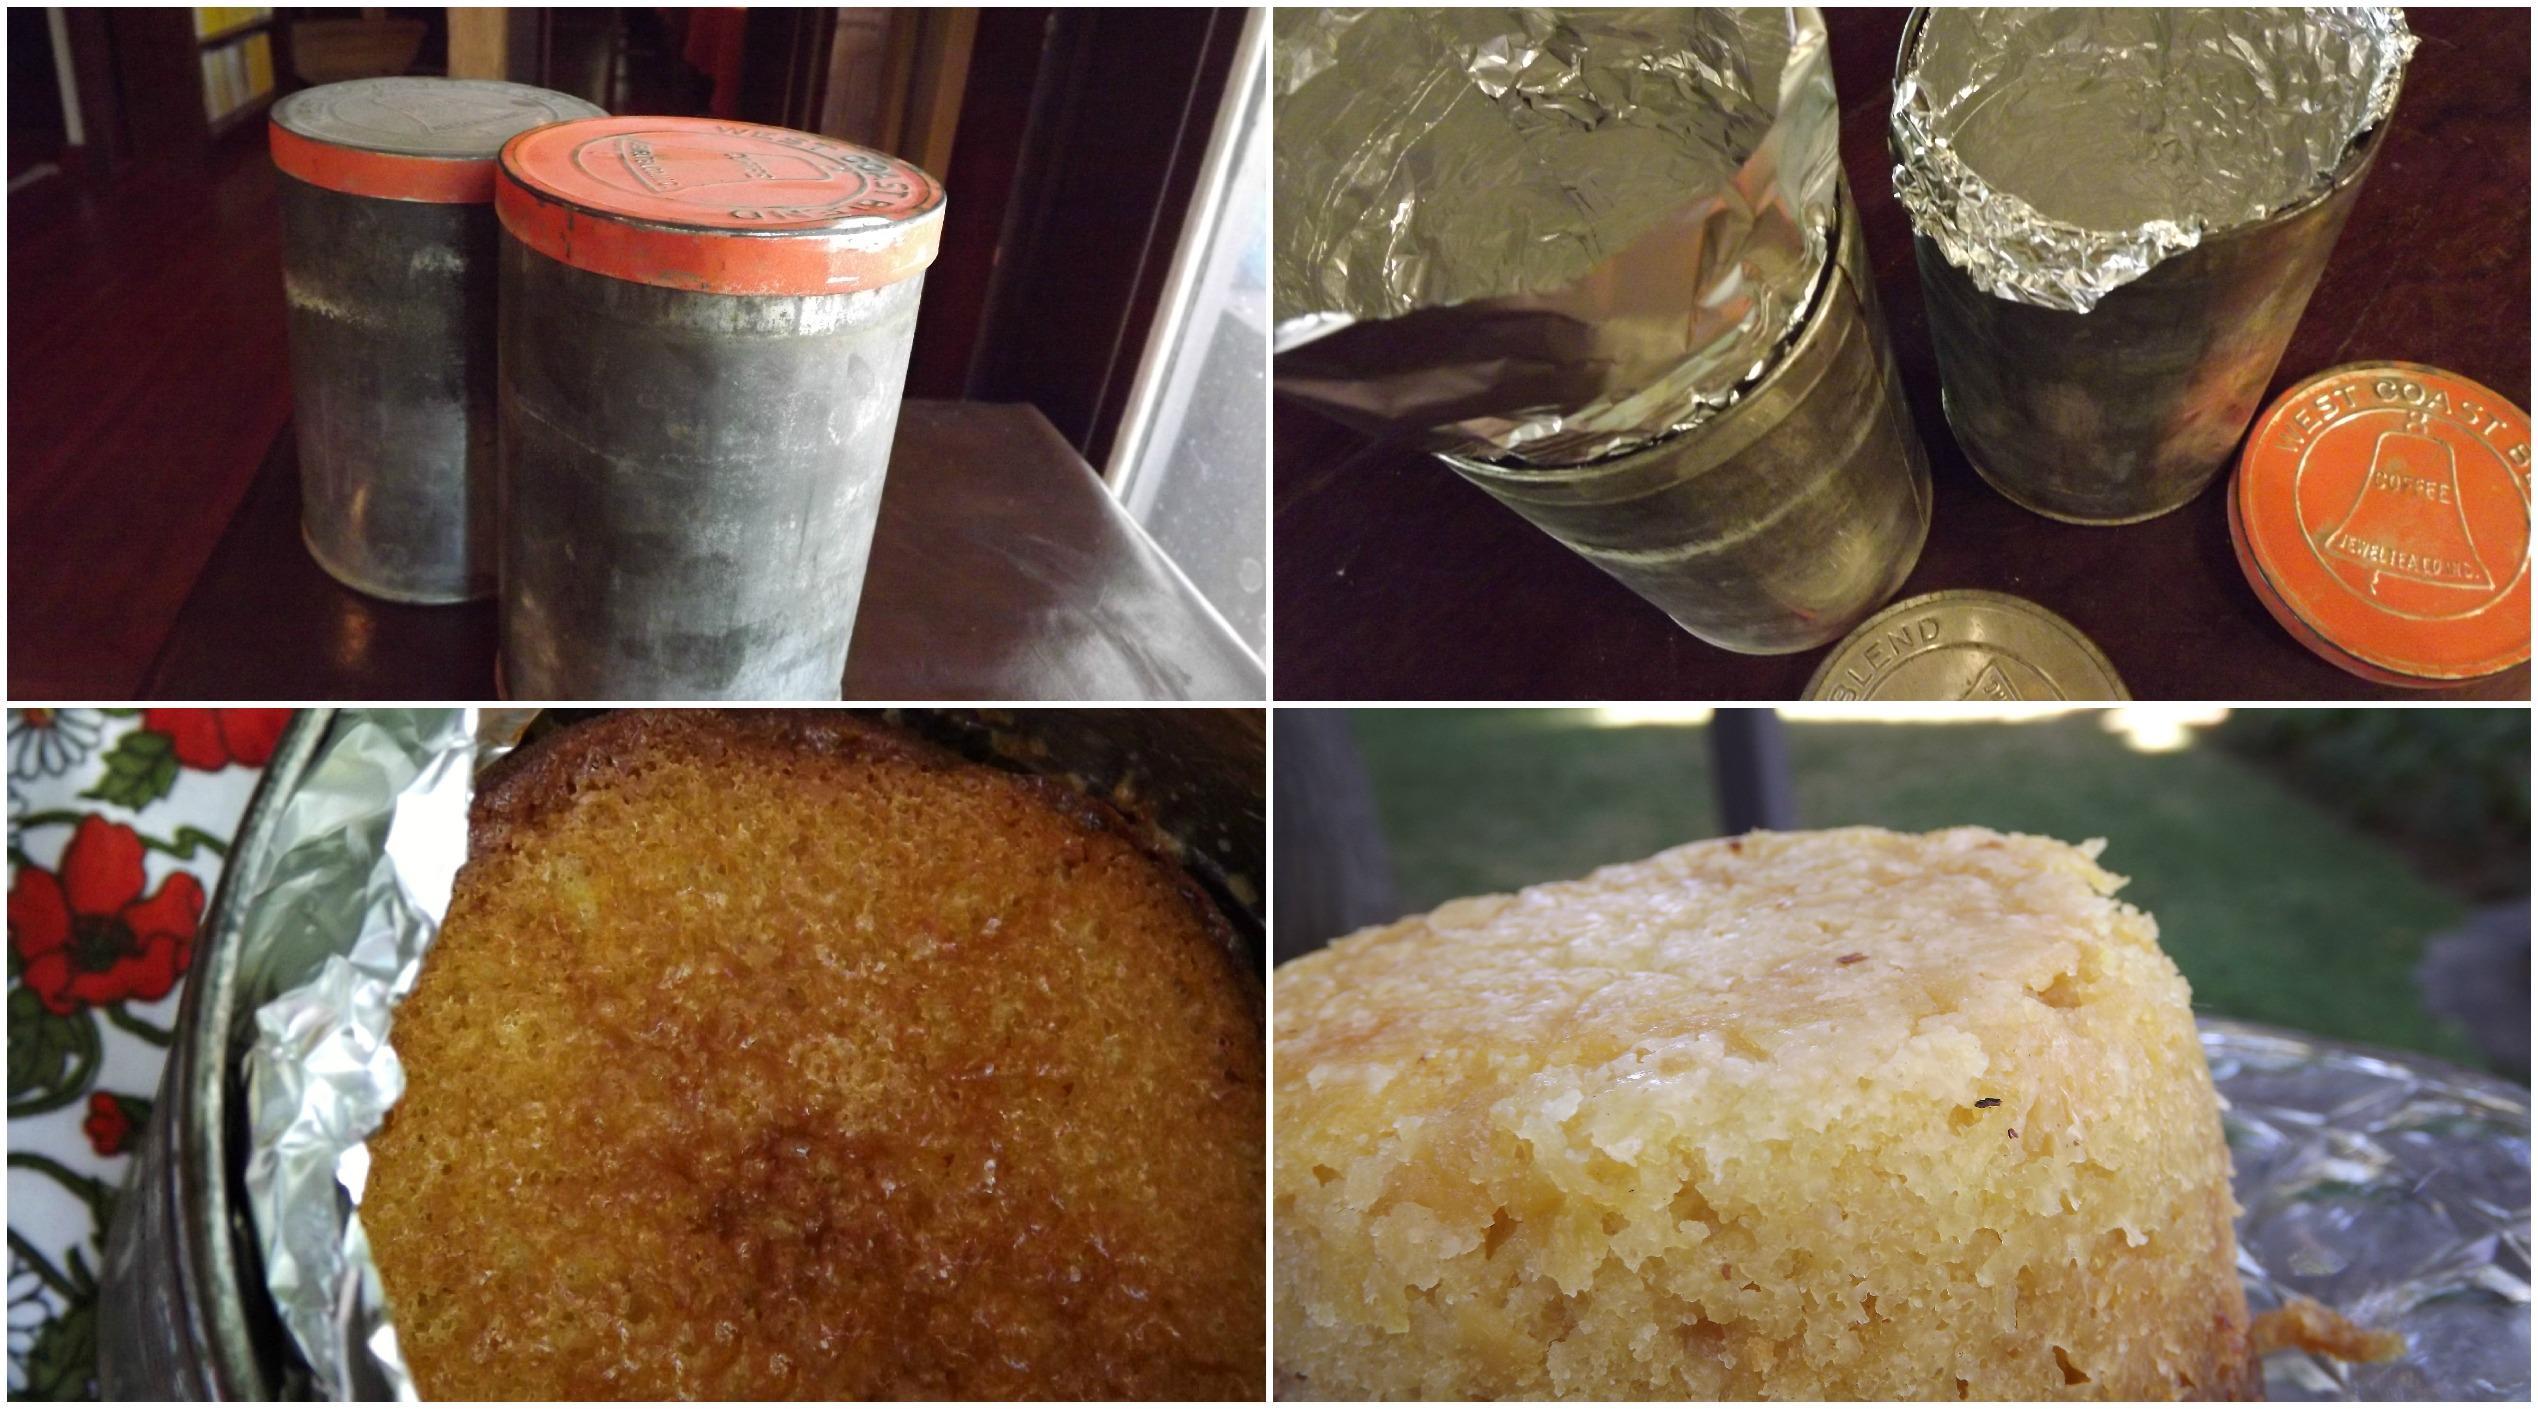 Grandma S Old Fashioned Pineapple Cake Recipe